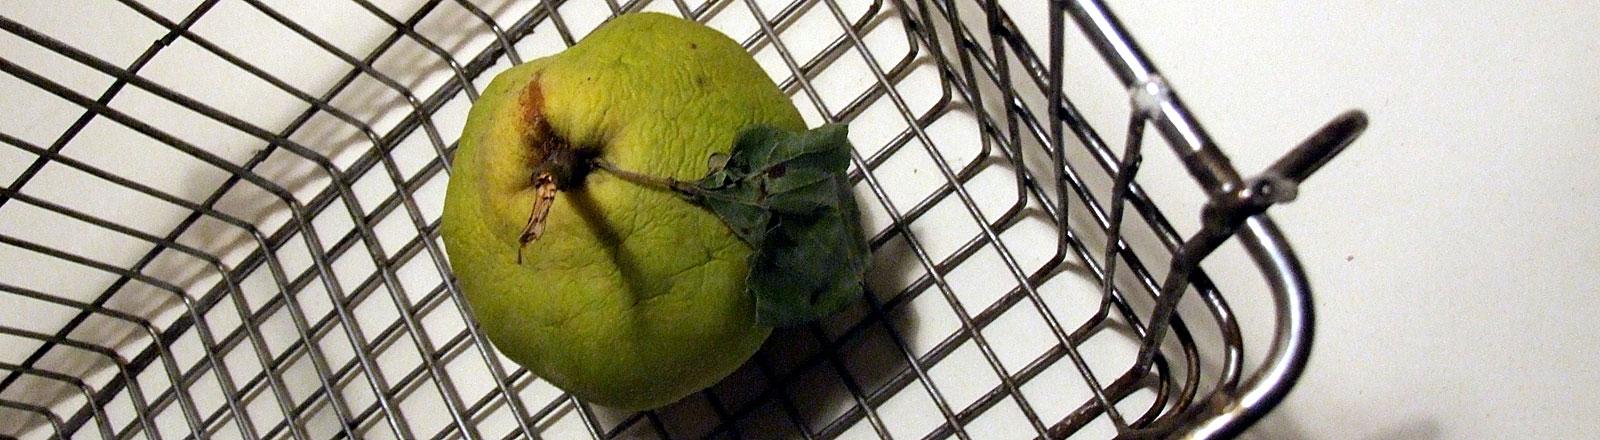 Alter Apfel im Supermarkt-Korb